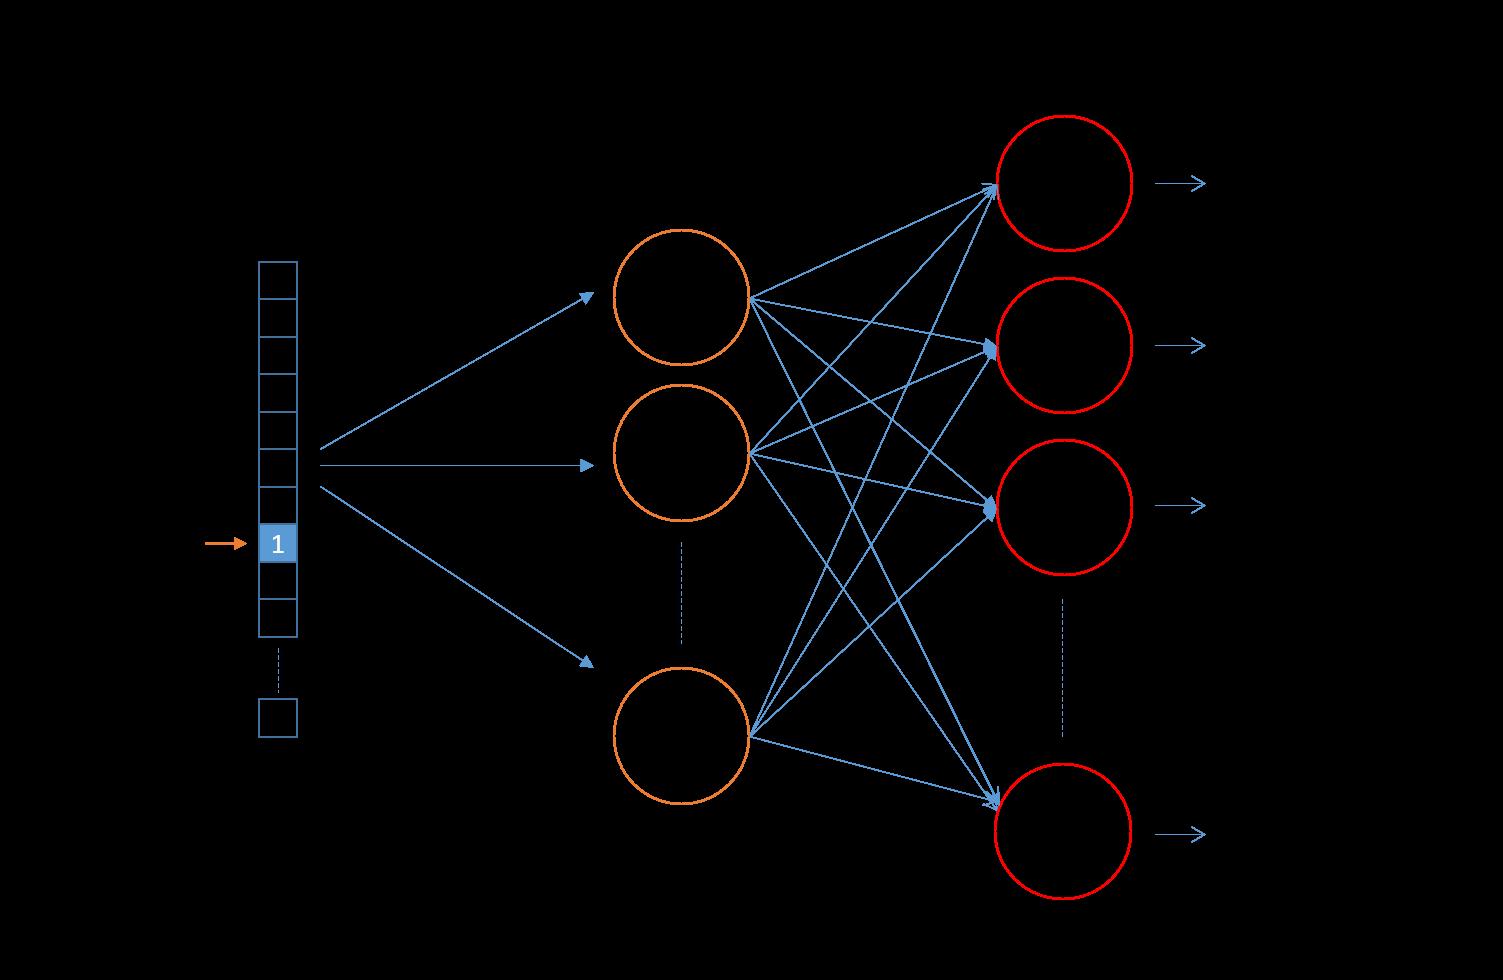 image black and white Skip gram network architecture. Neuron vector neural net